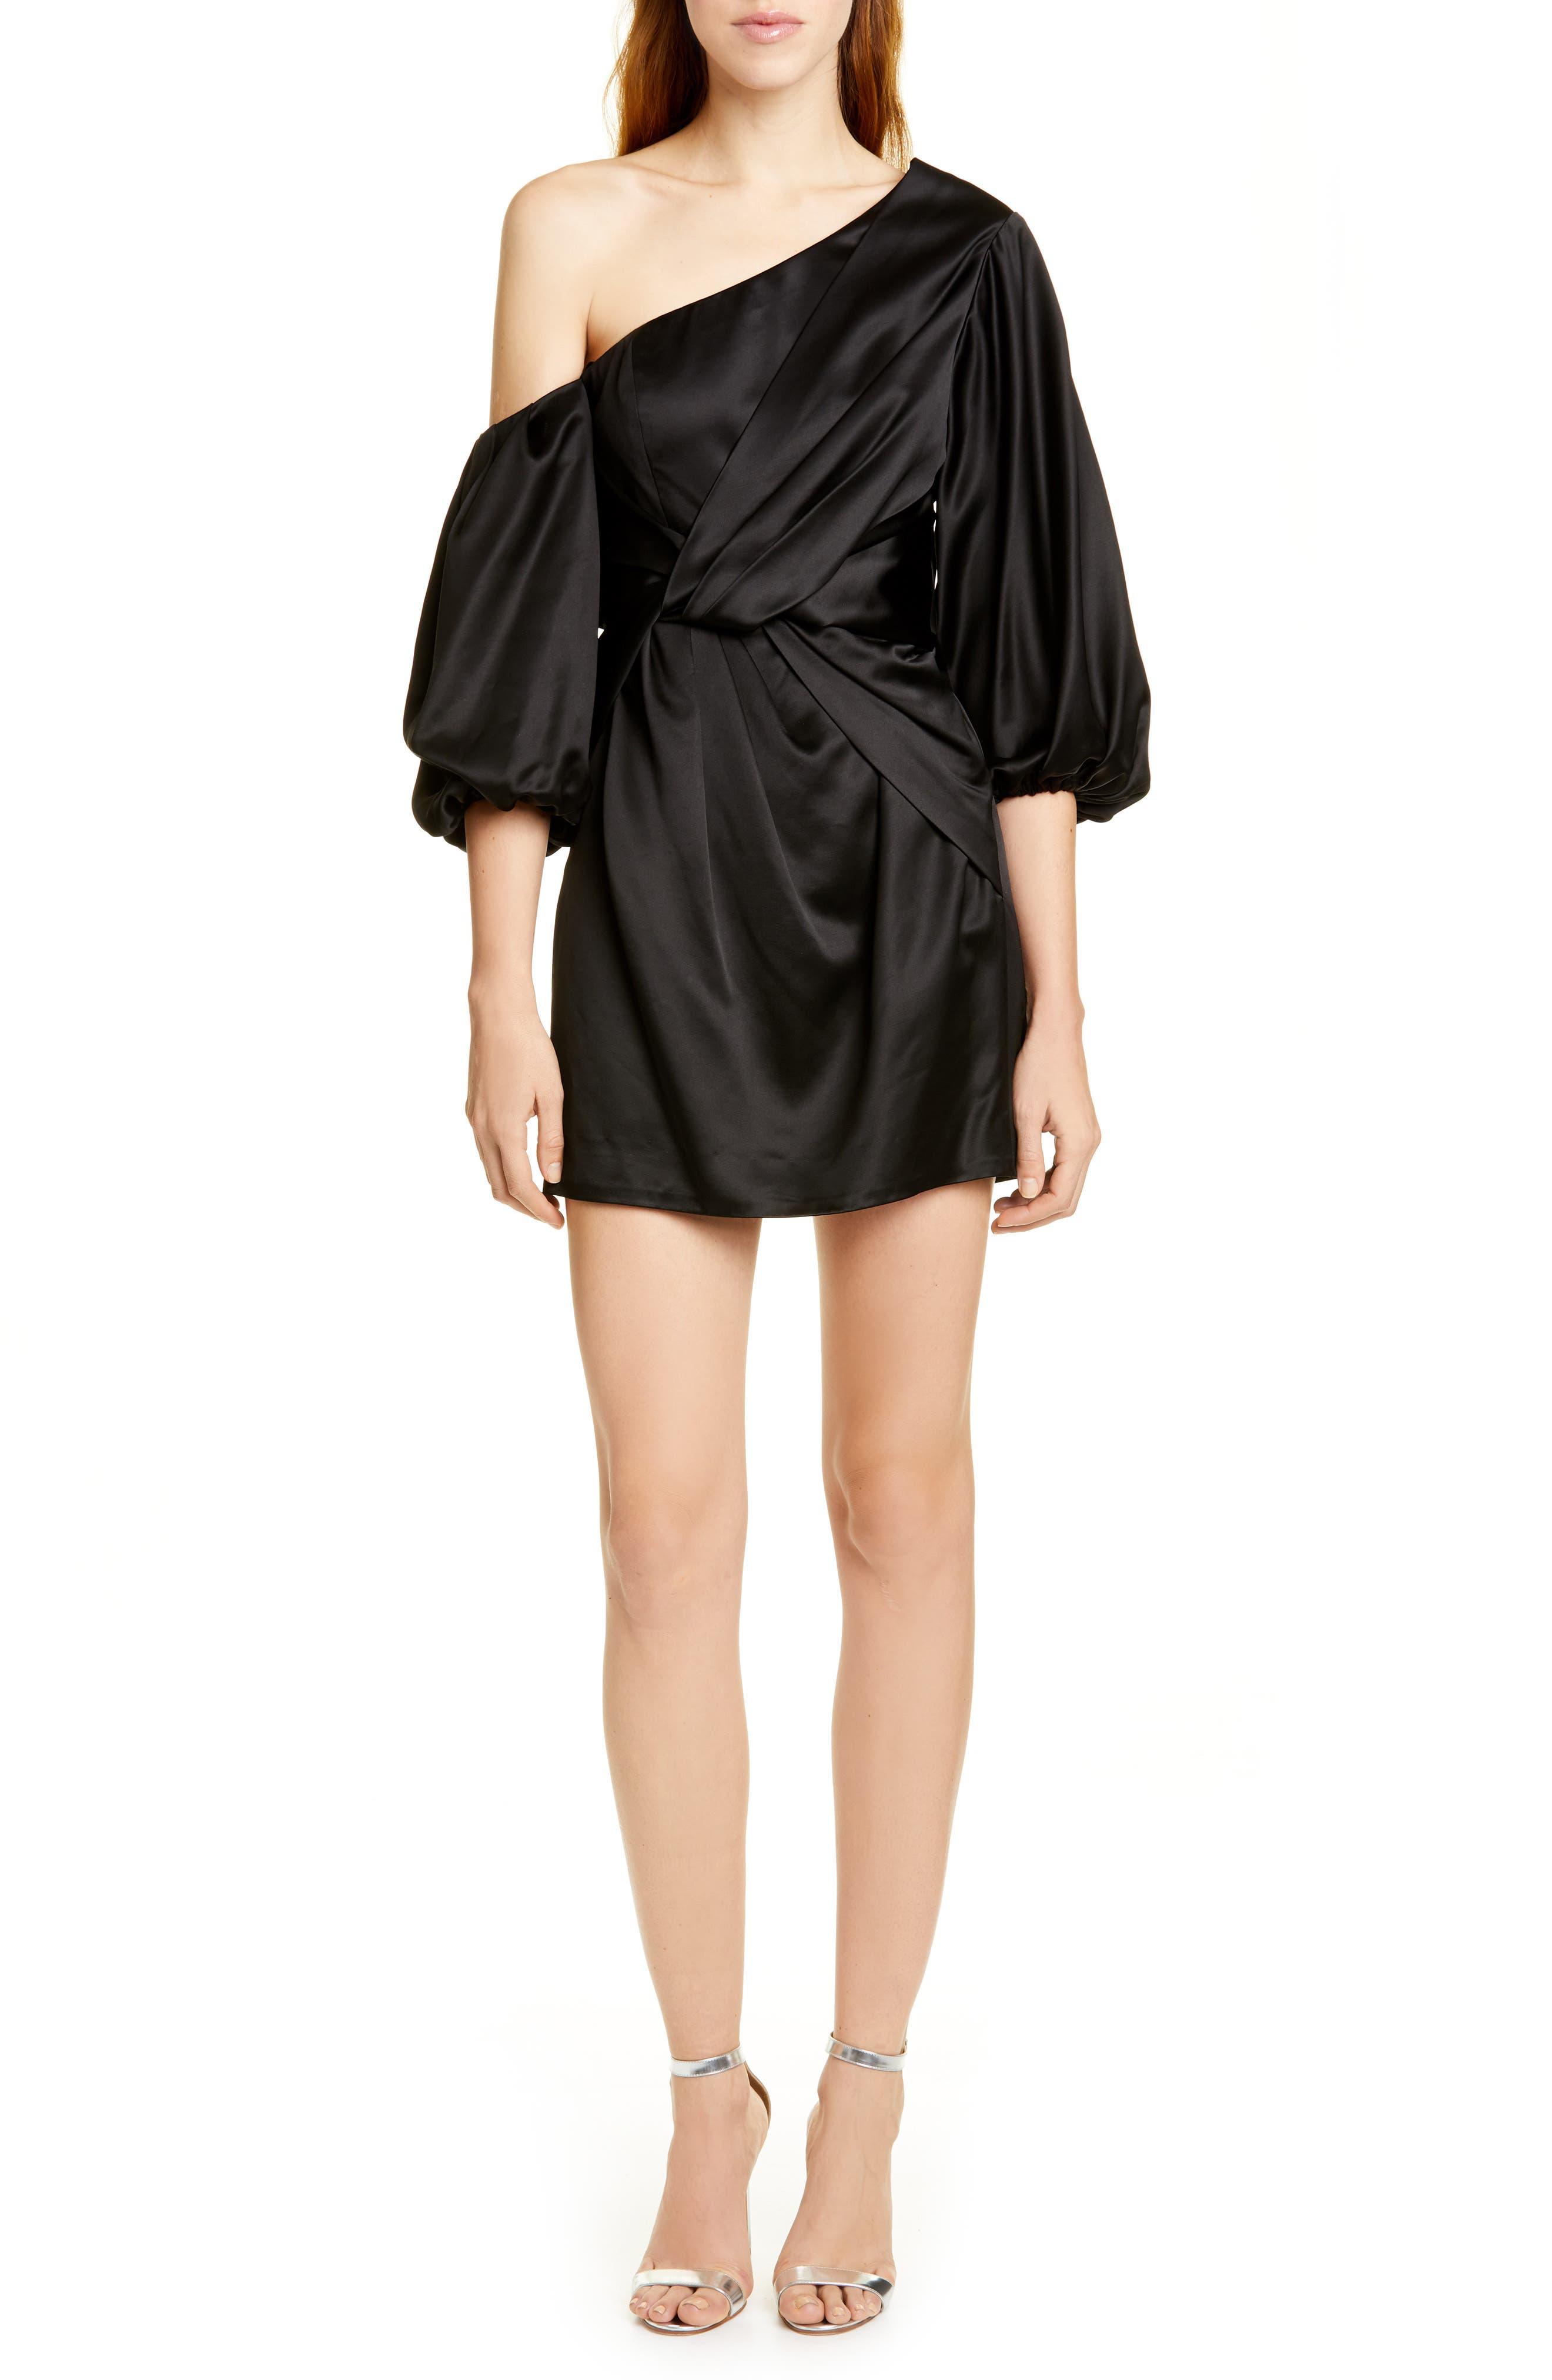 Amur Dresses Alessandra One-Shoulder Satin Minidress